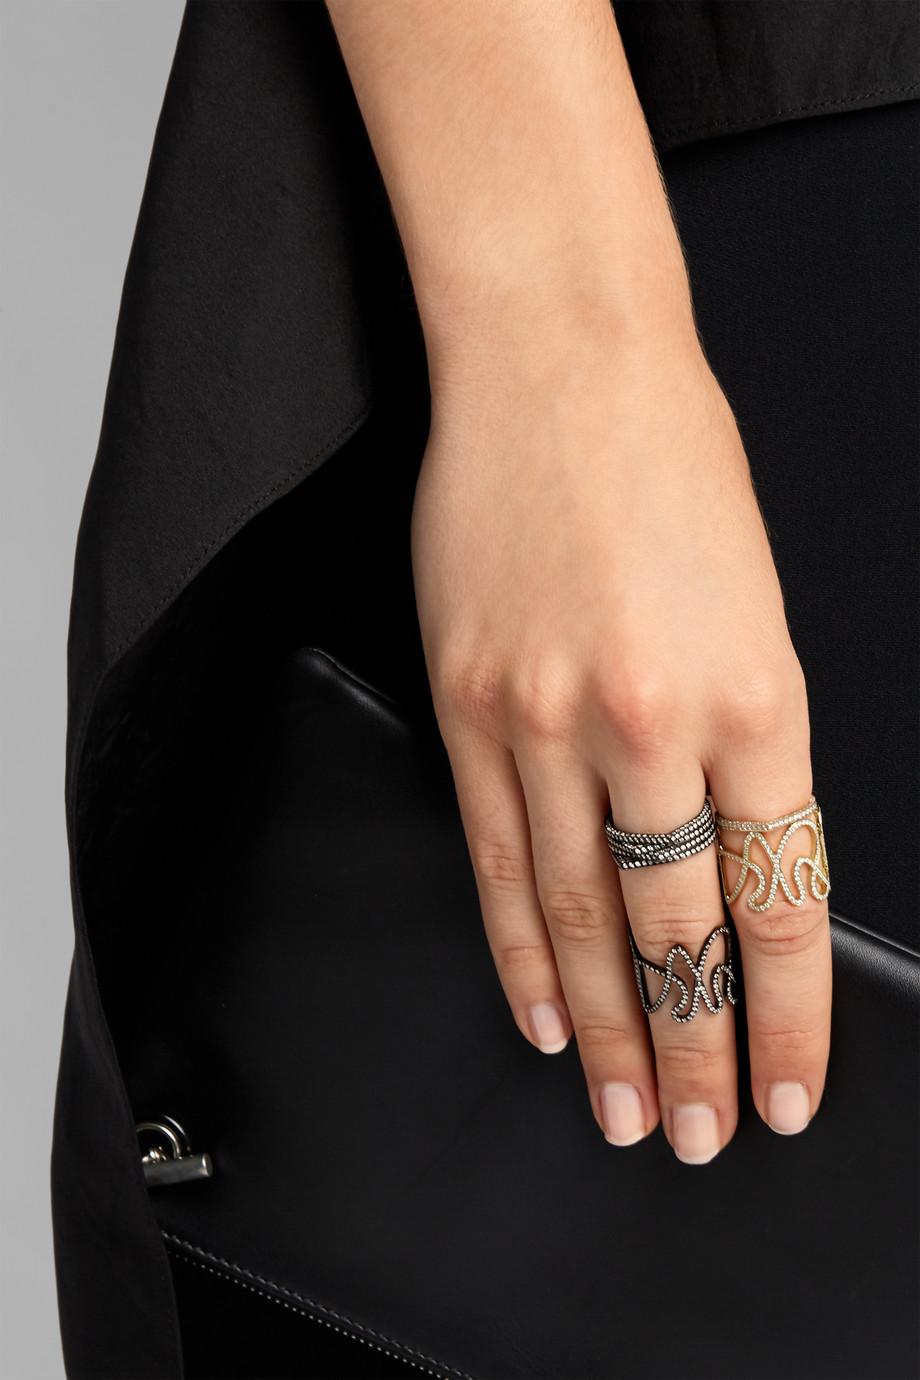 Repossi White Noise 18-karat gold diamond ring